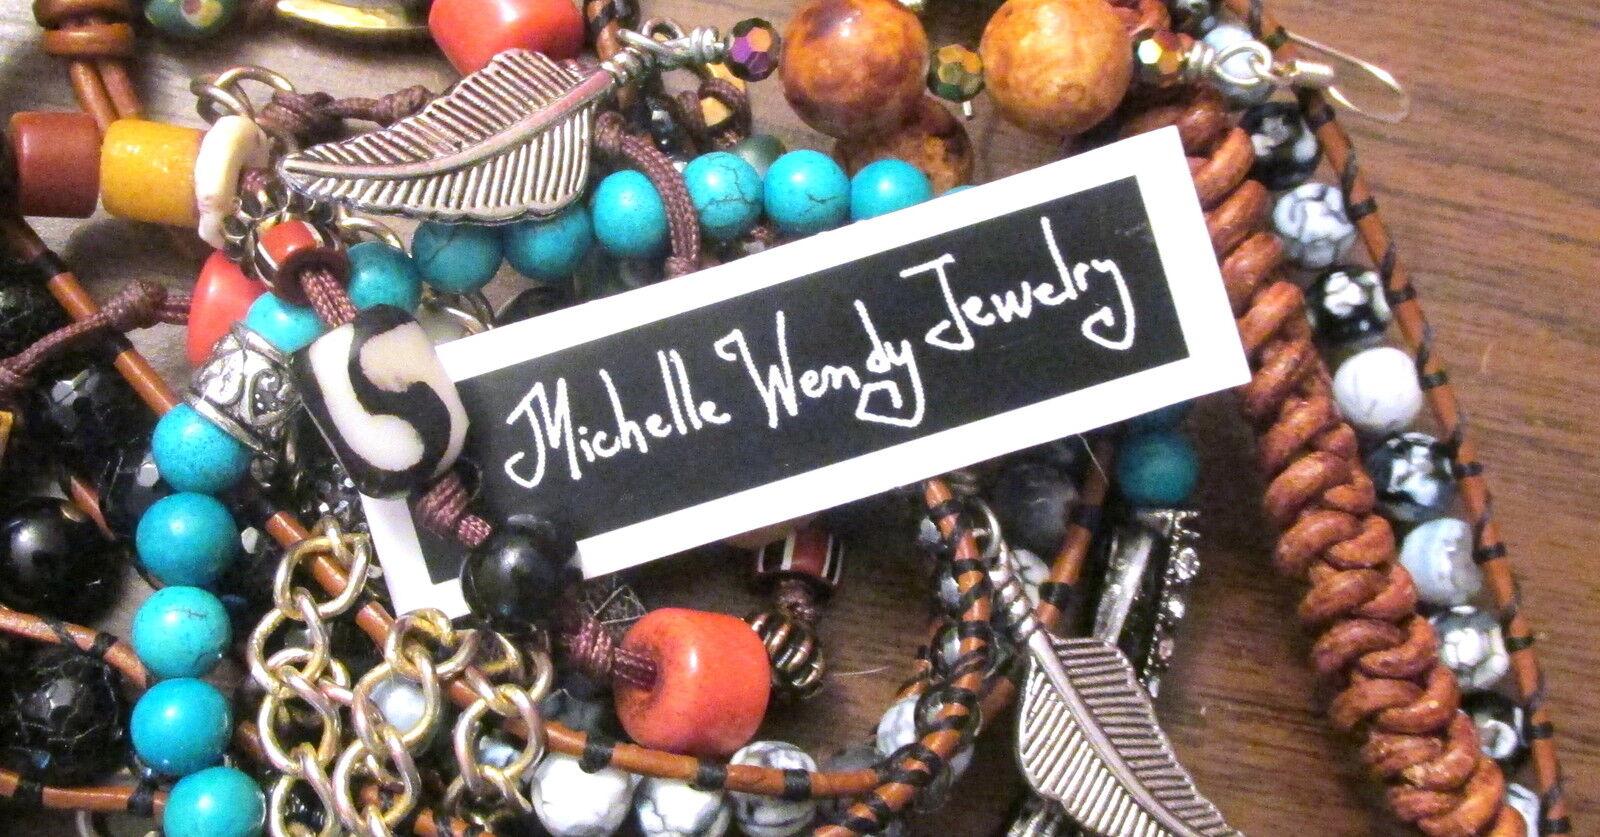 michellewendyjewelry